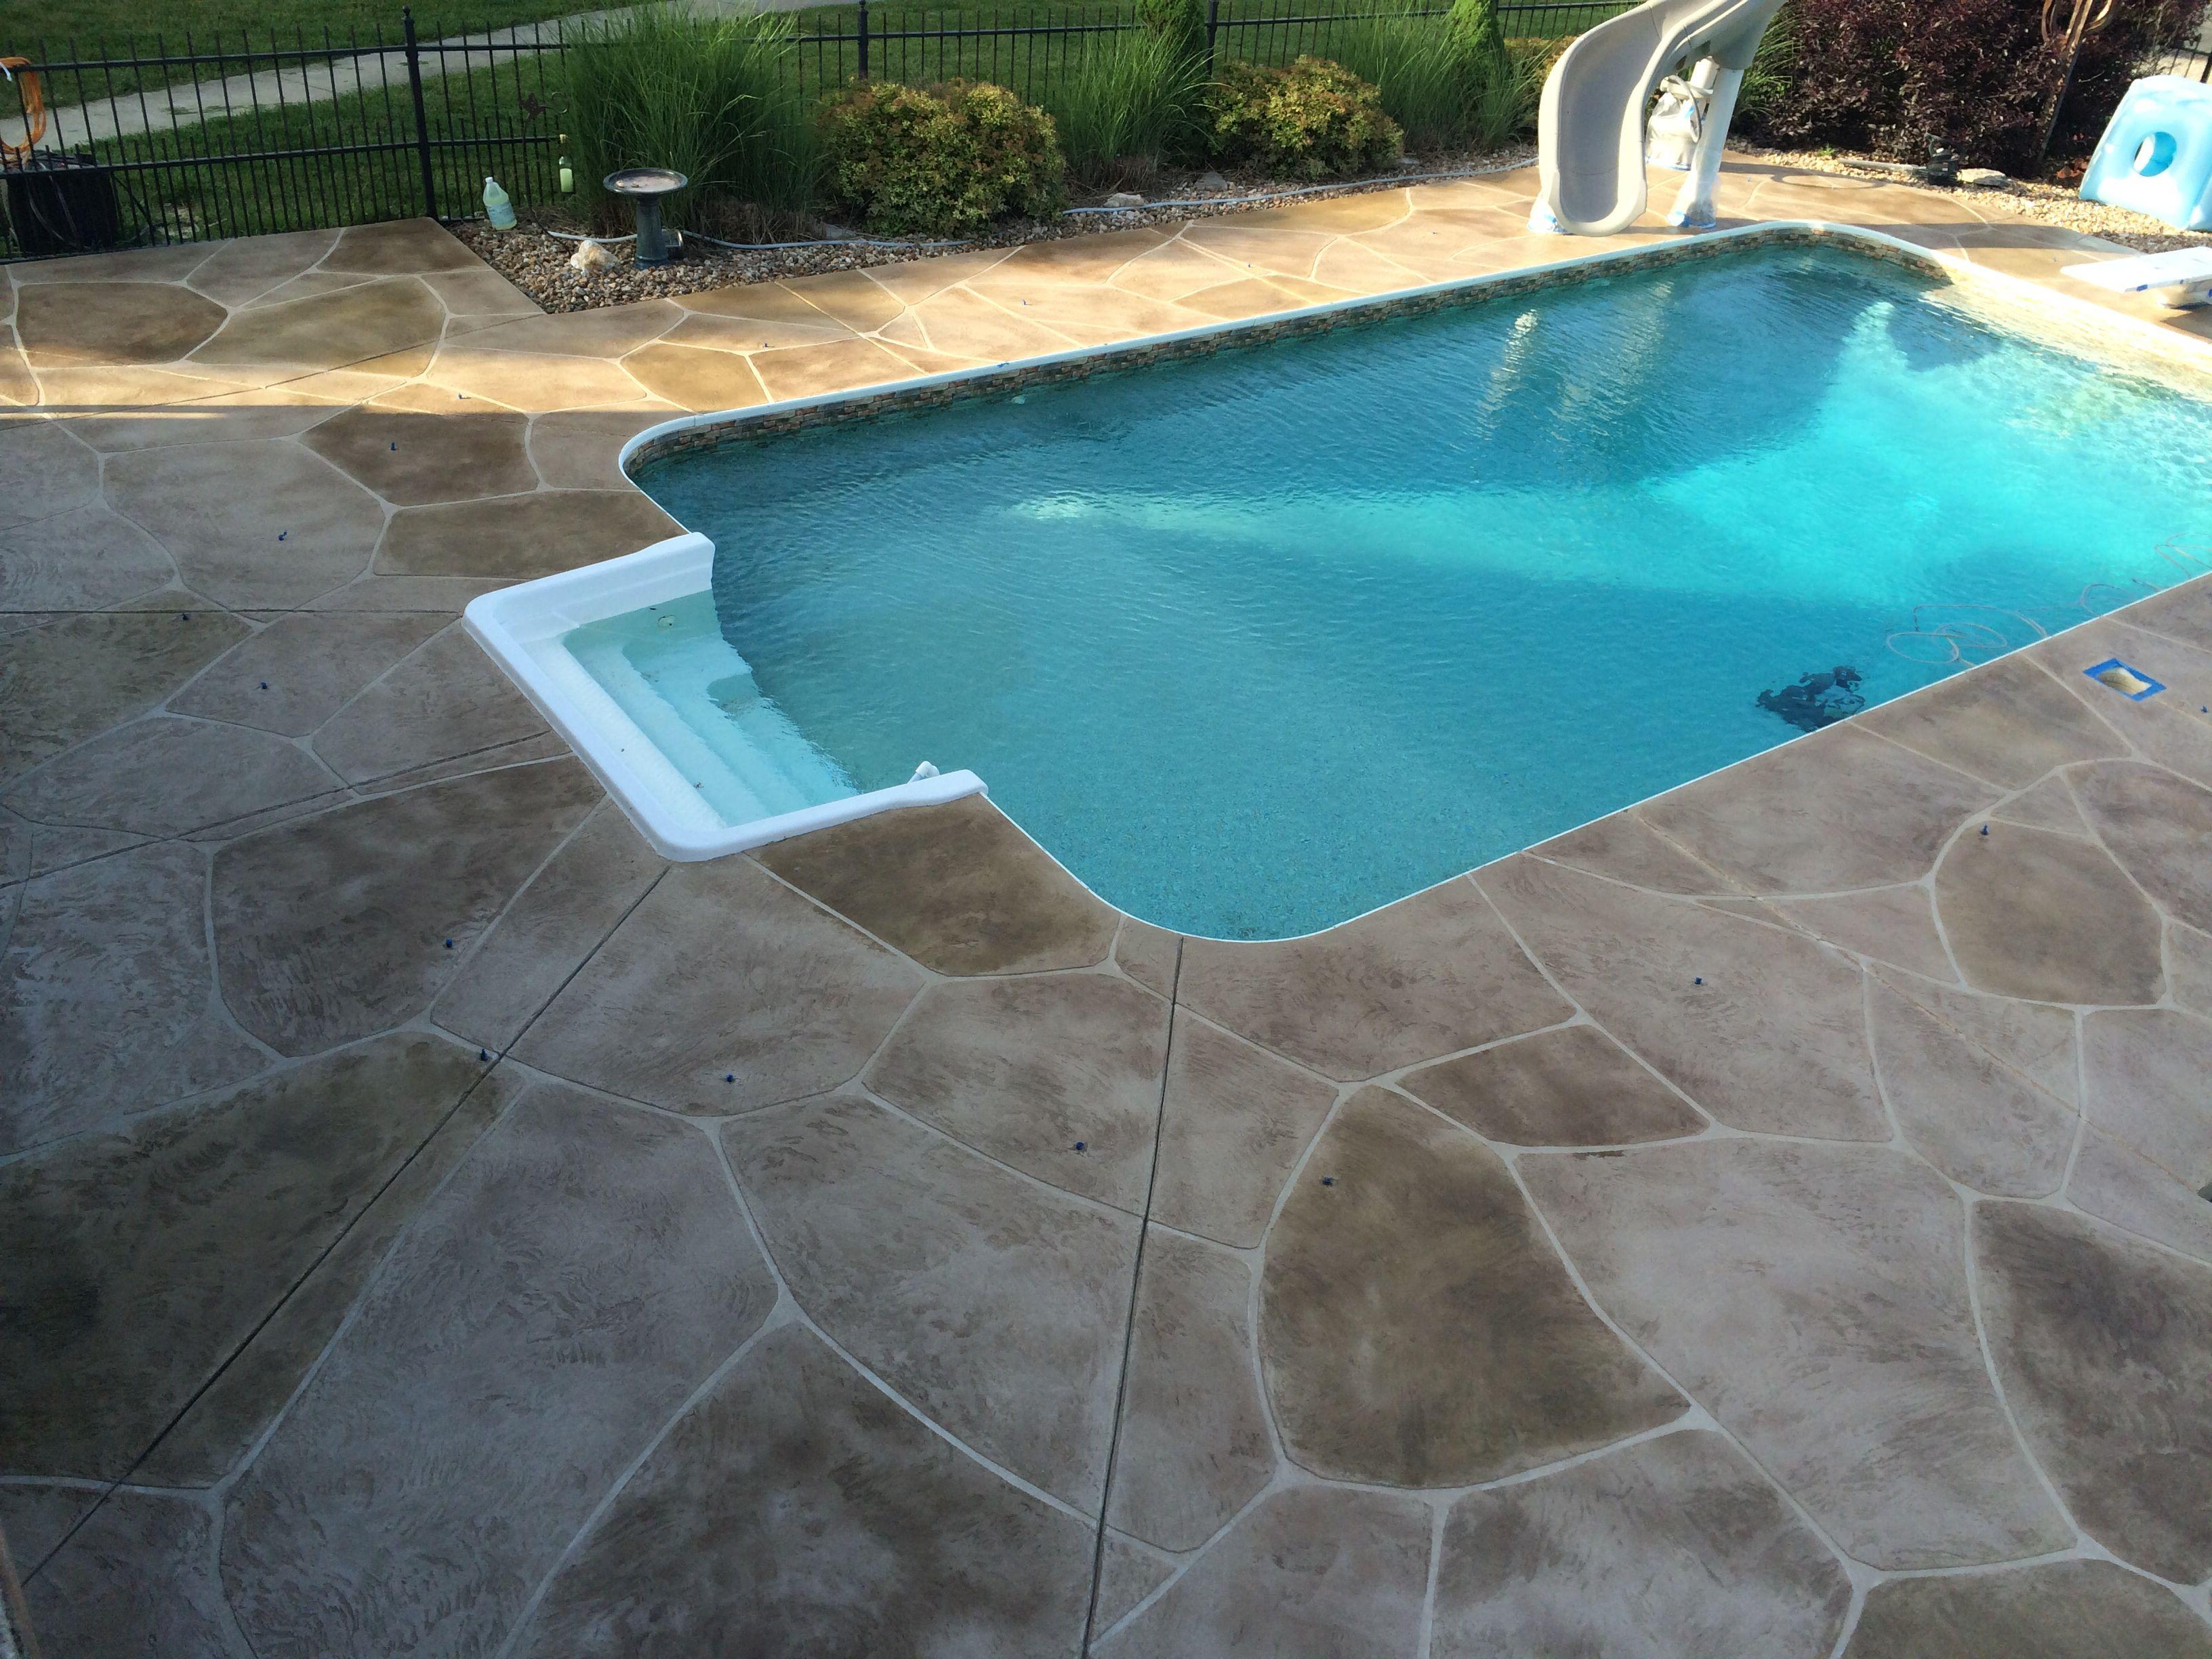 Tuscan trowel resurfacing on this pool deck